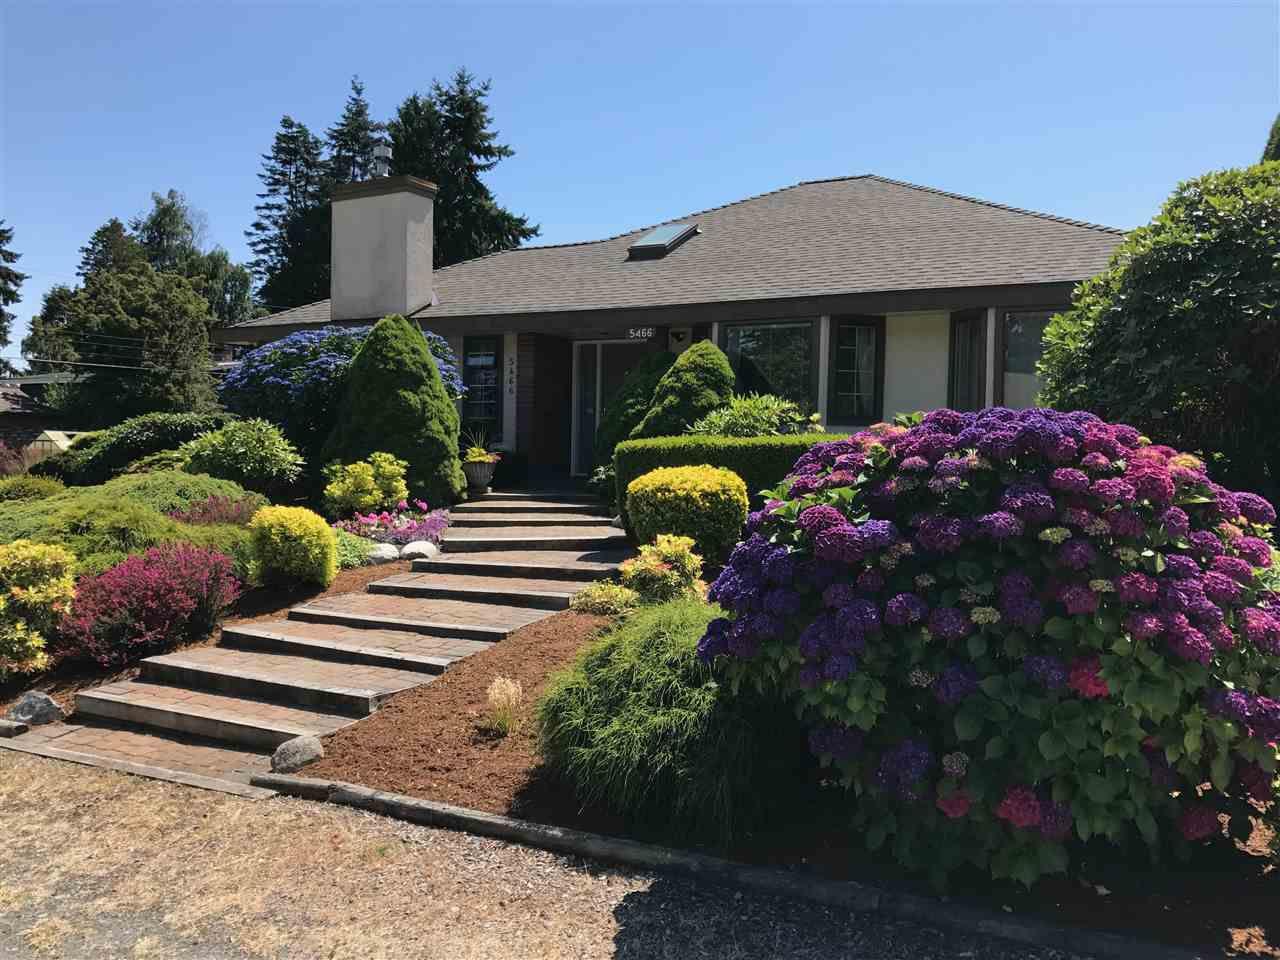 Main Photo: 5466 15B Avenue in Delta: Cliff Drive House for sale (Tsawwassen)  : MLS®# R2211847